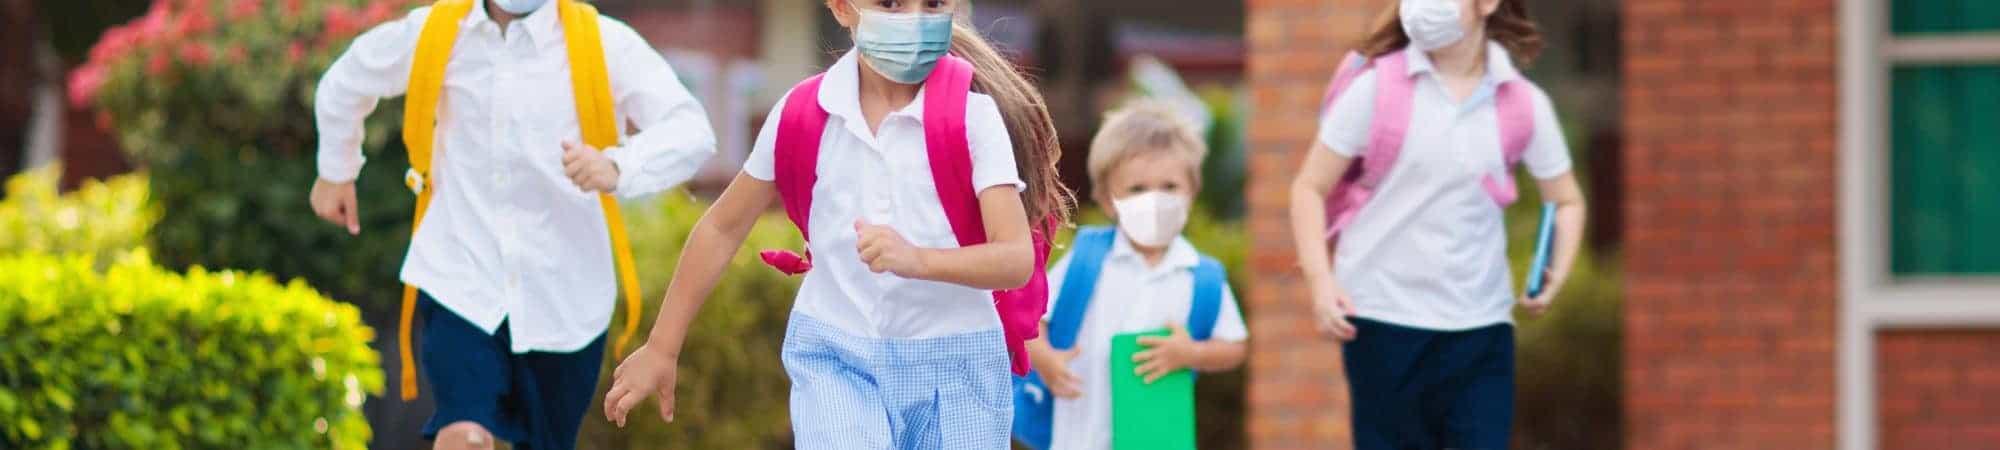 crianças de máscara correndo na escola